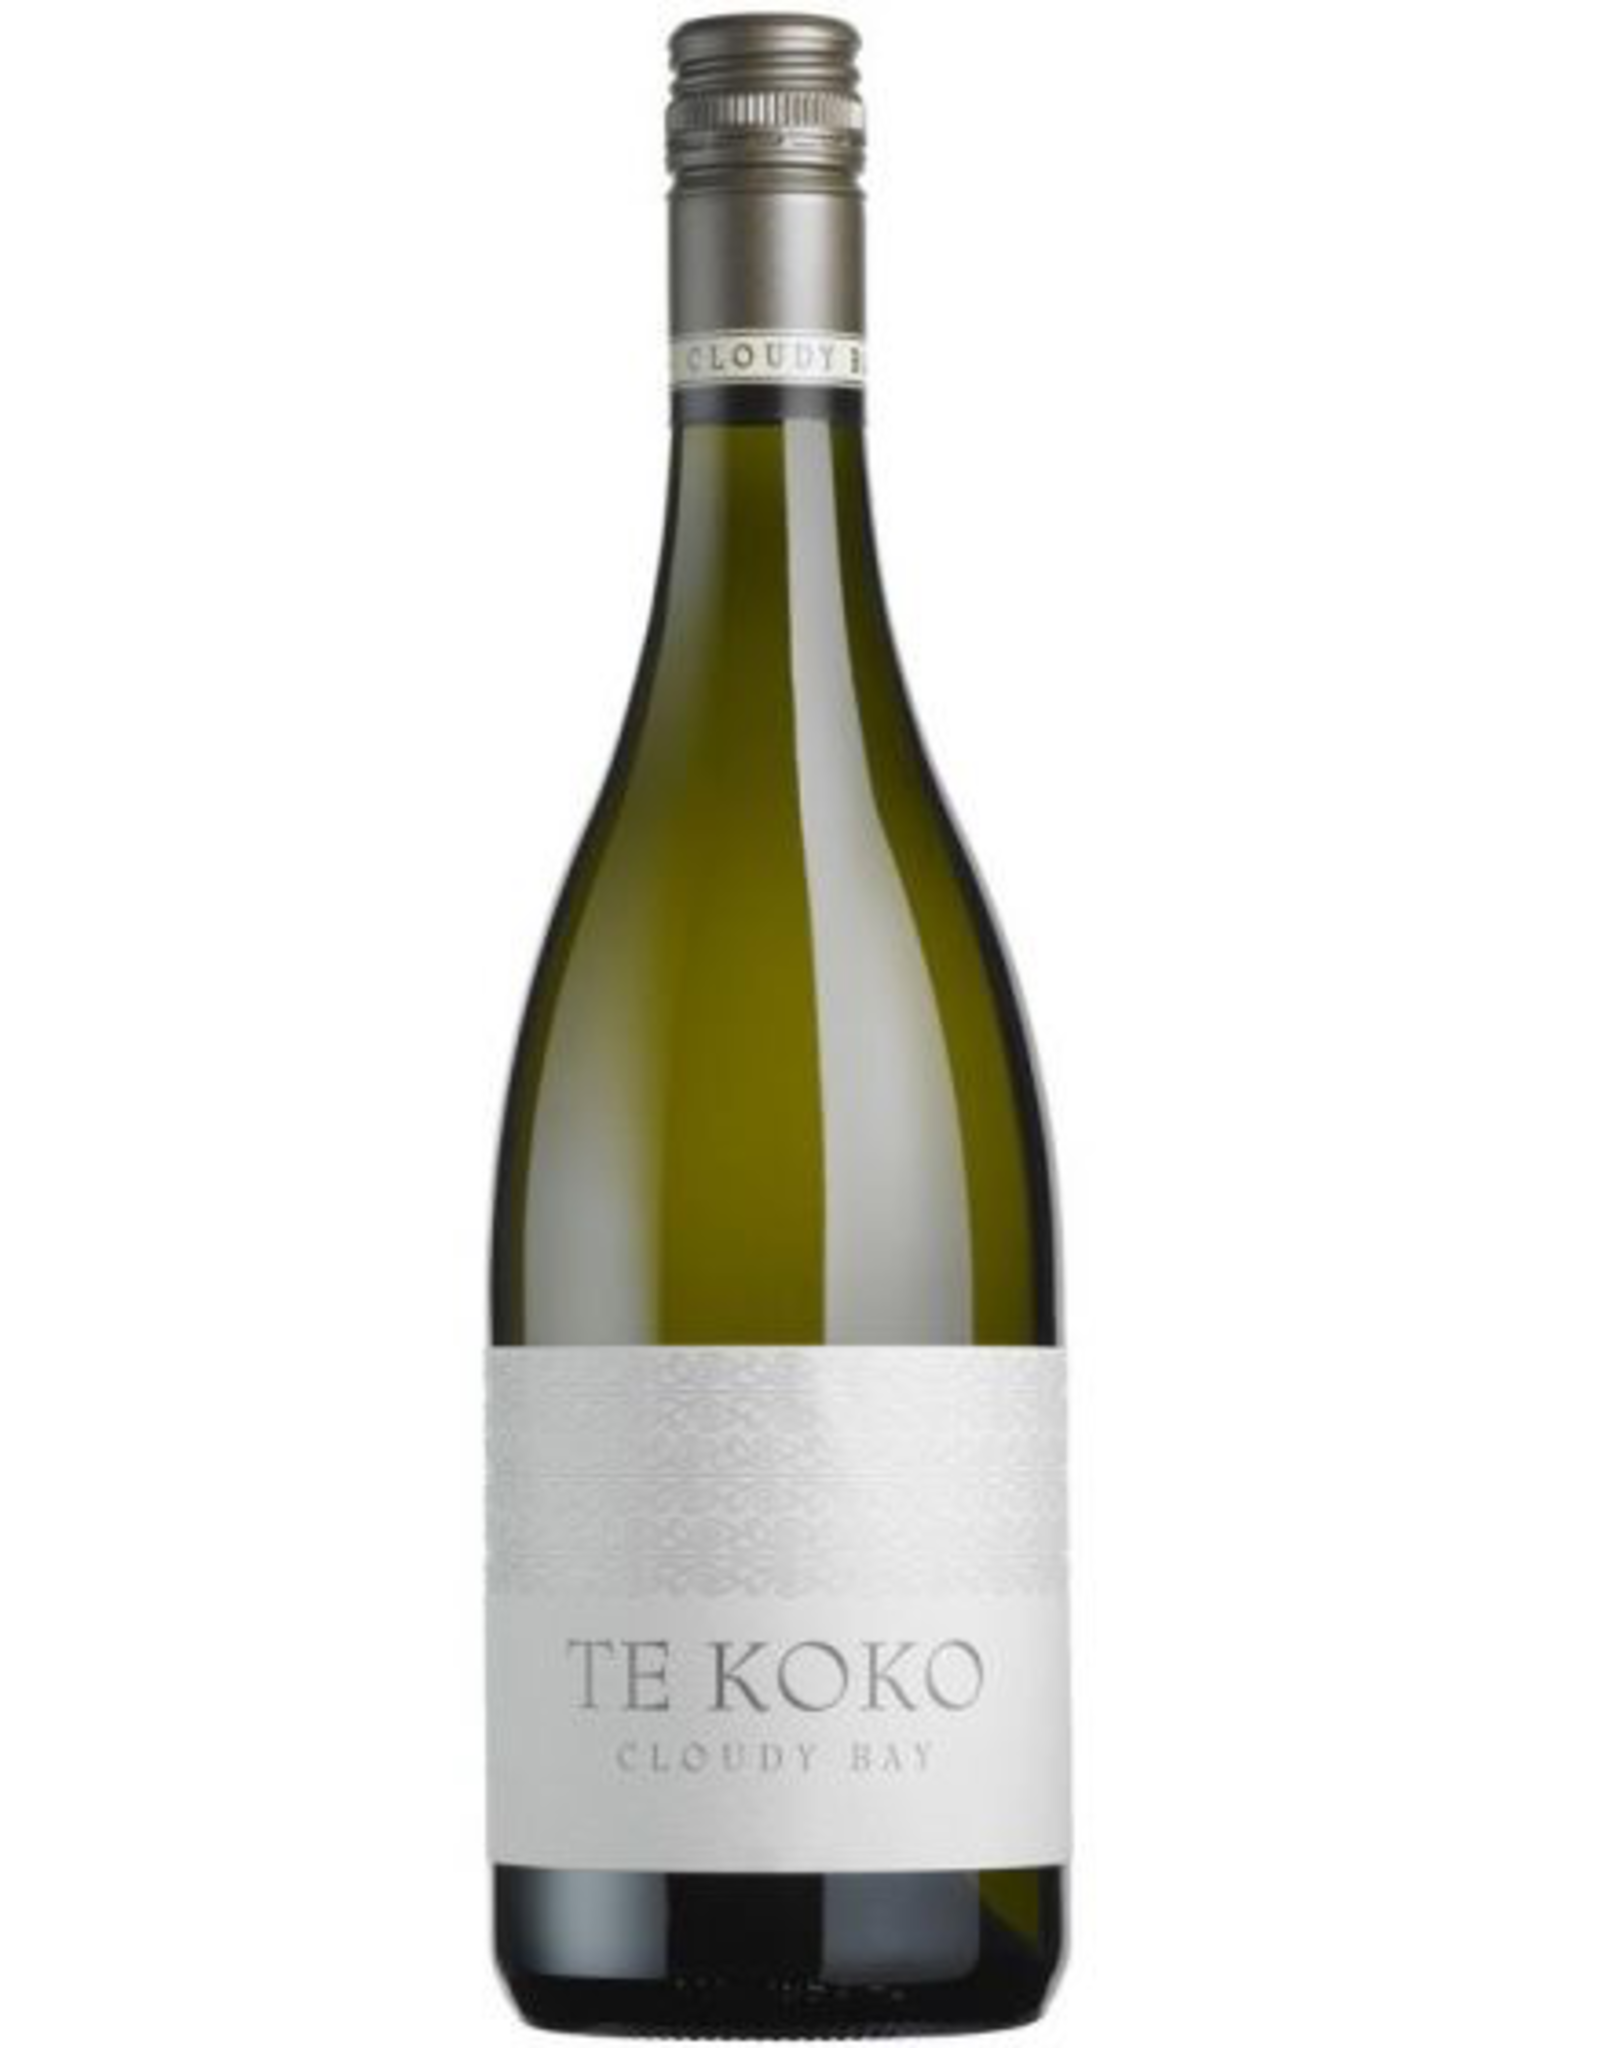 White Wine 2016, Cloudy Bay TE KOKO, Sauvignon Blanc, Marlborough, Marlborough, New Zealand, 13.5% Alc, CT